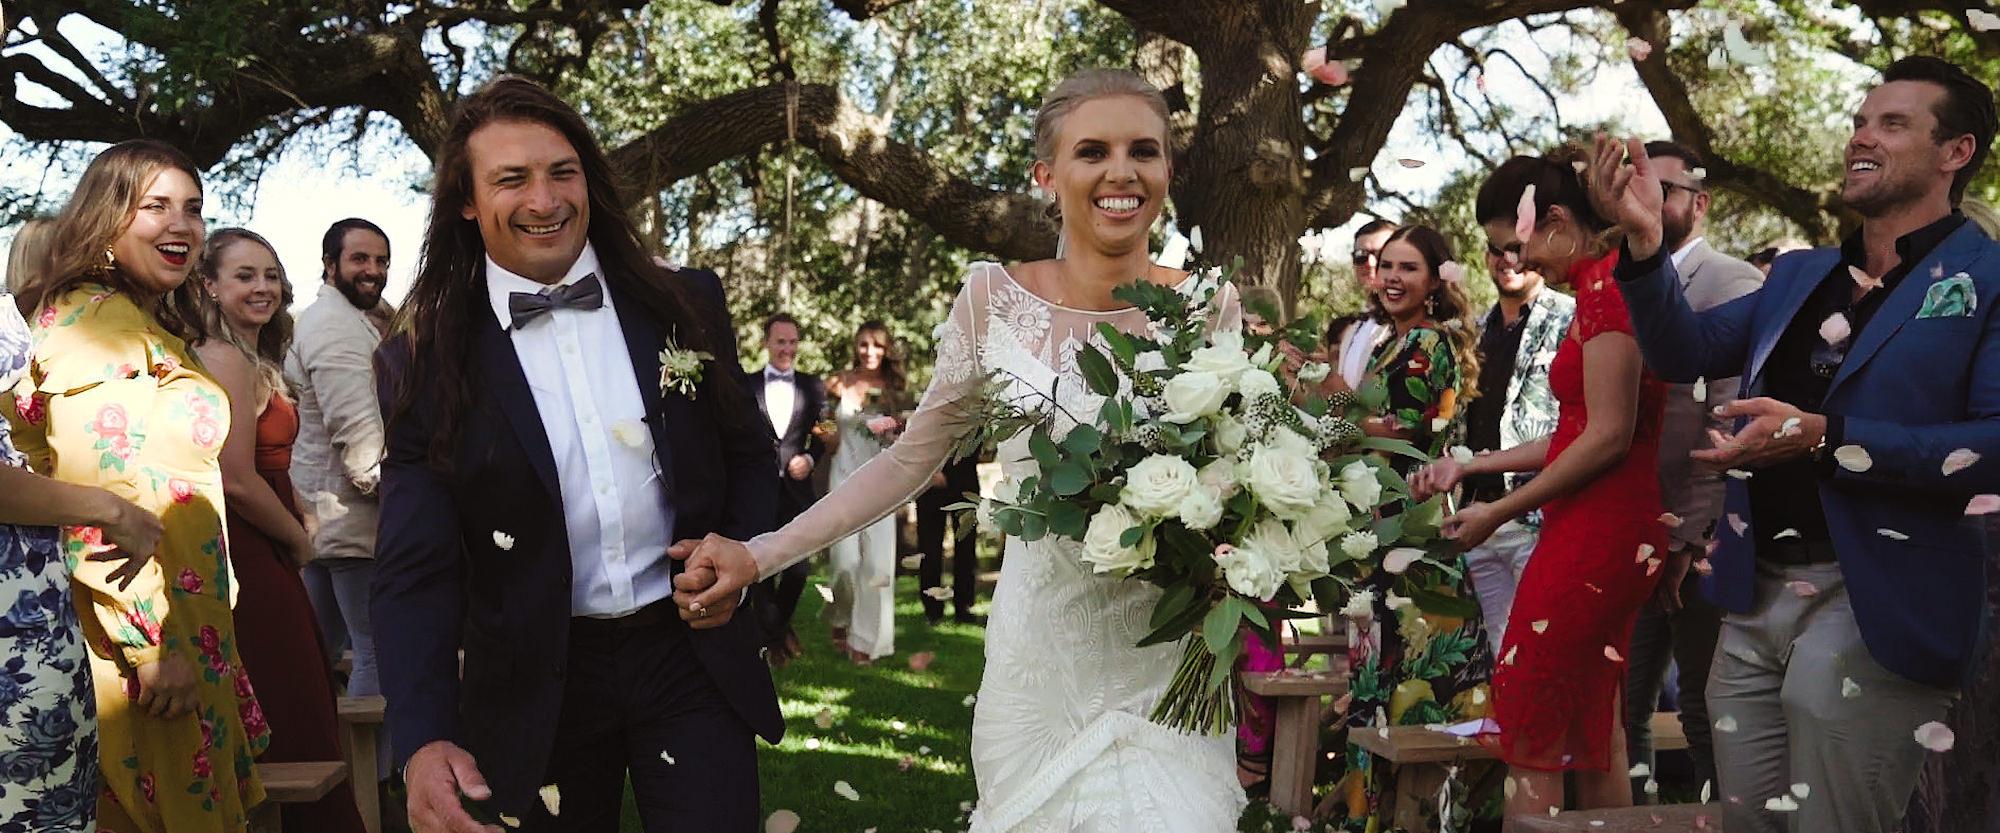 HeathEmelieWeddingFilm_Babylonstoren_Wedding_14.jpg